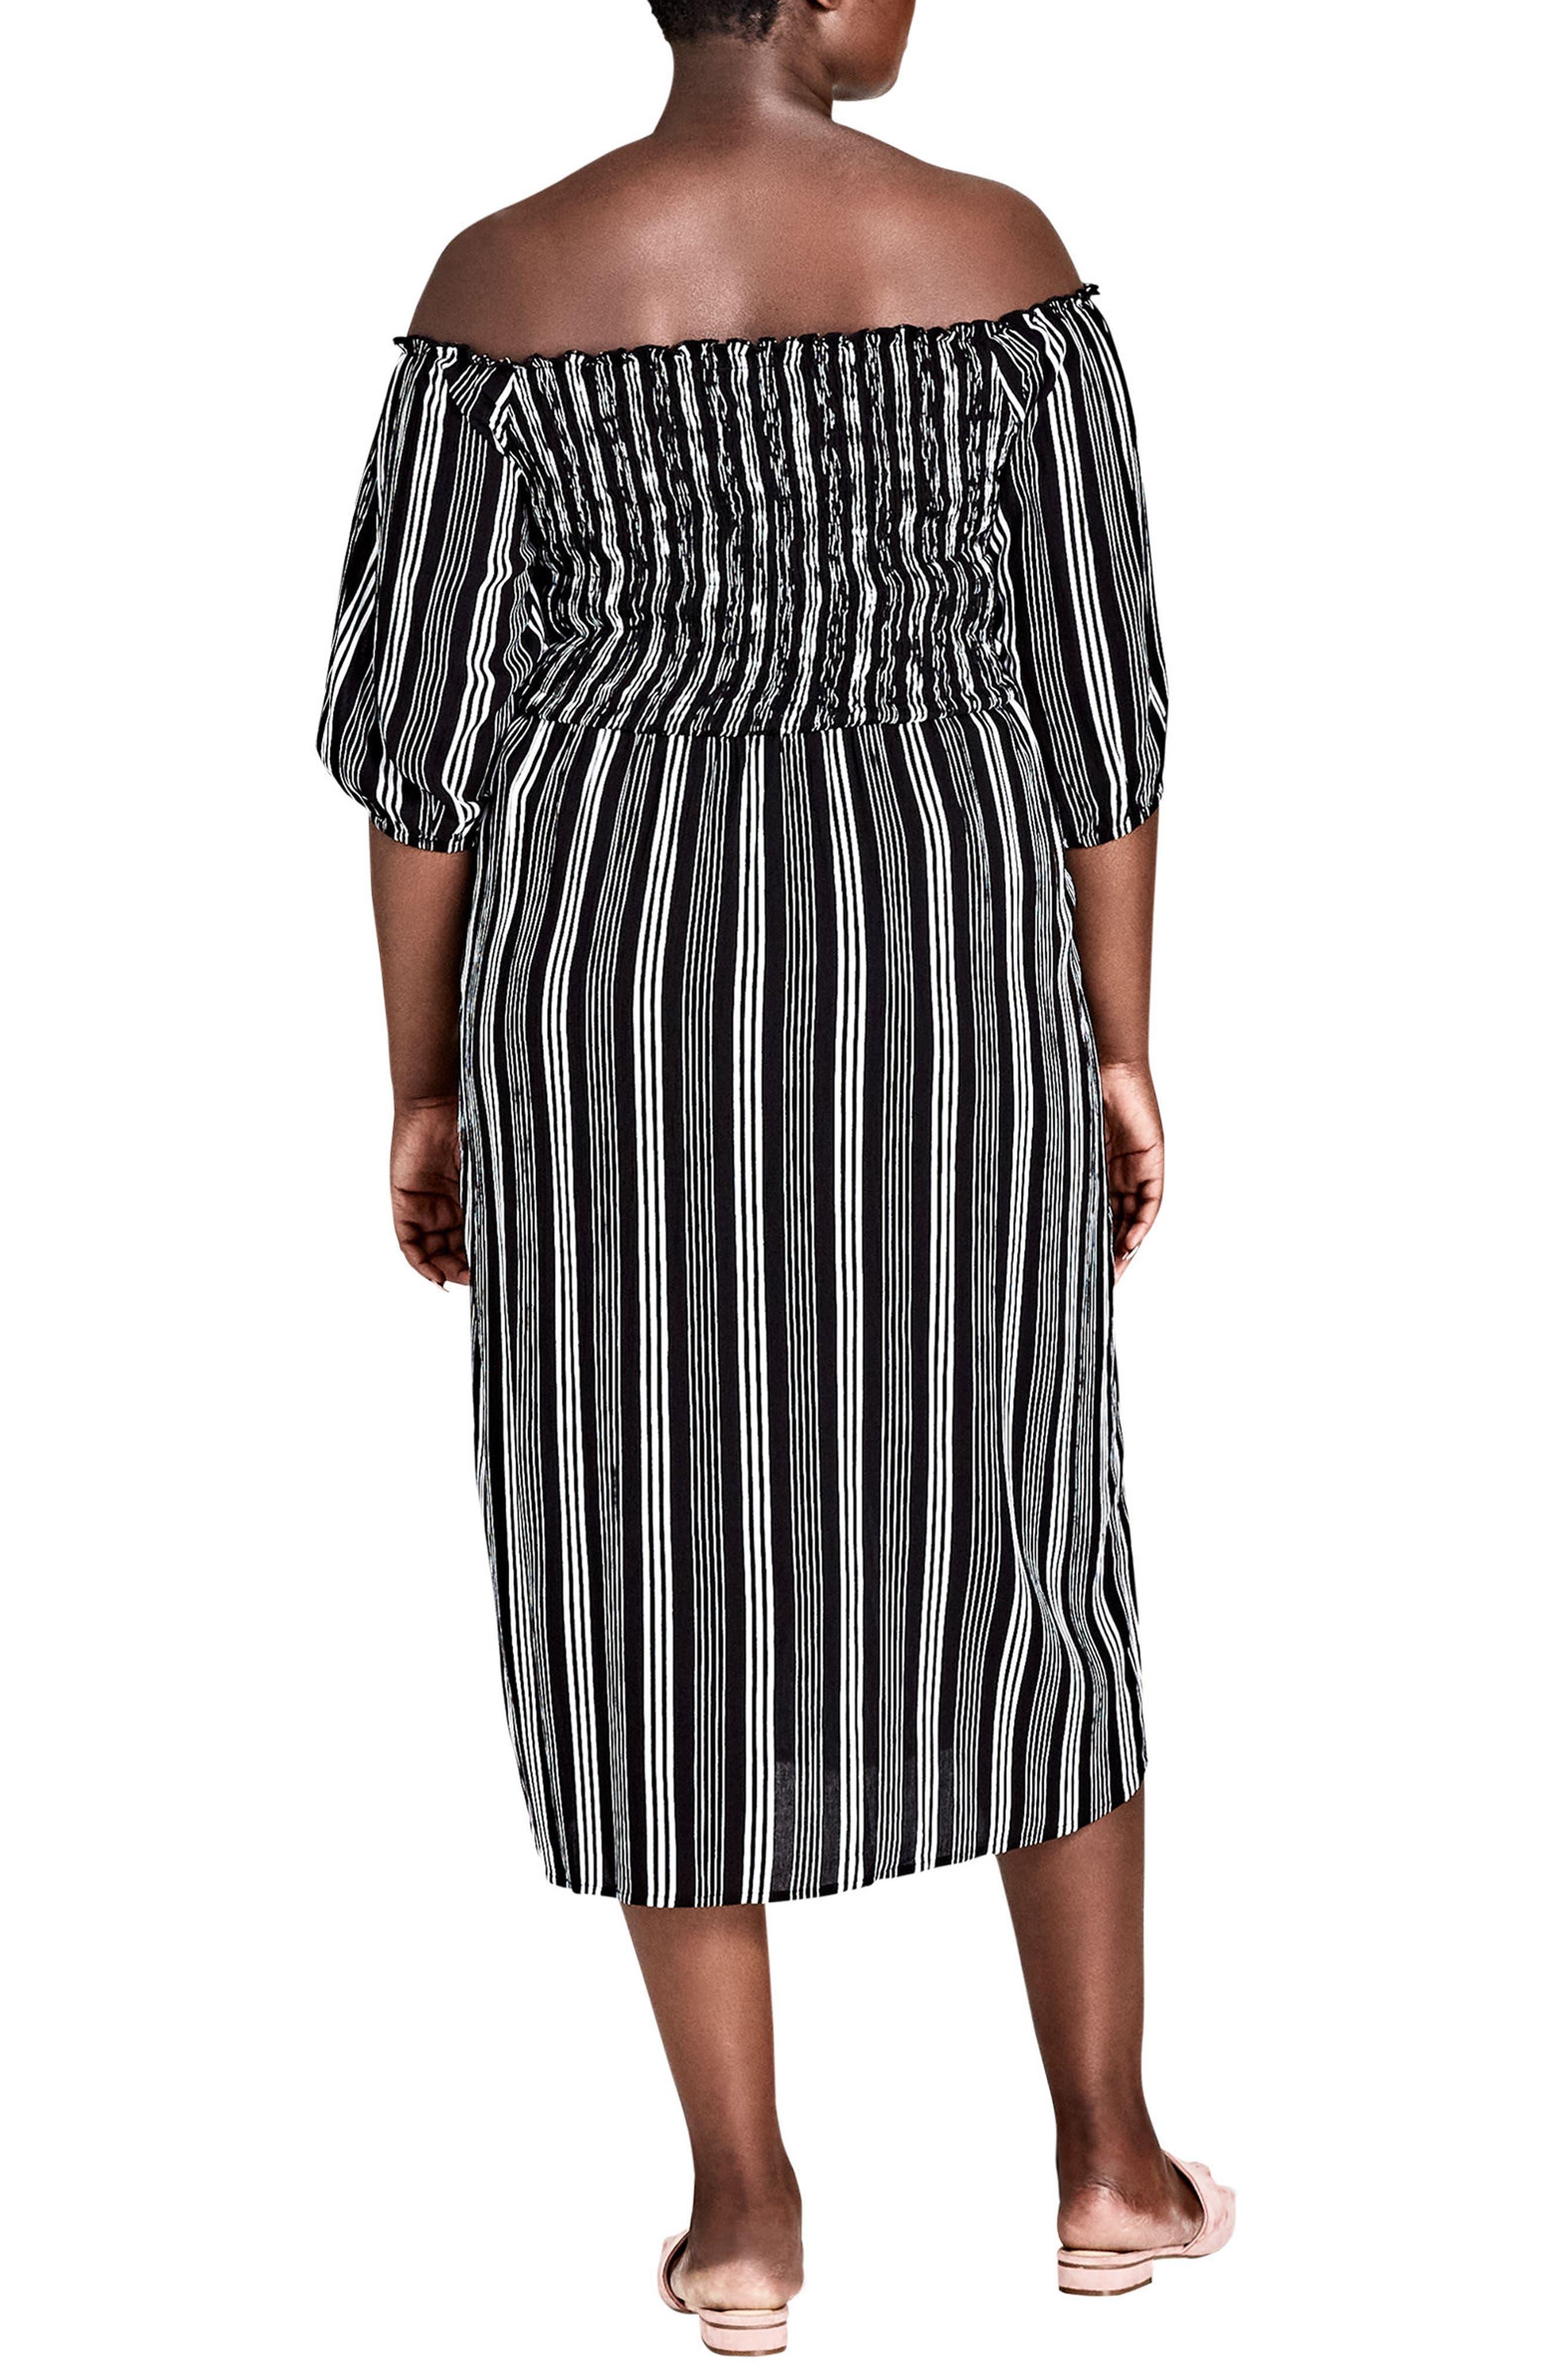 Stripe Play Off the Shoulder Midi Dress,                             Alternate thumbnail 2, color,                             STRIPE PLAY